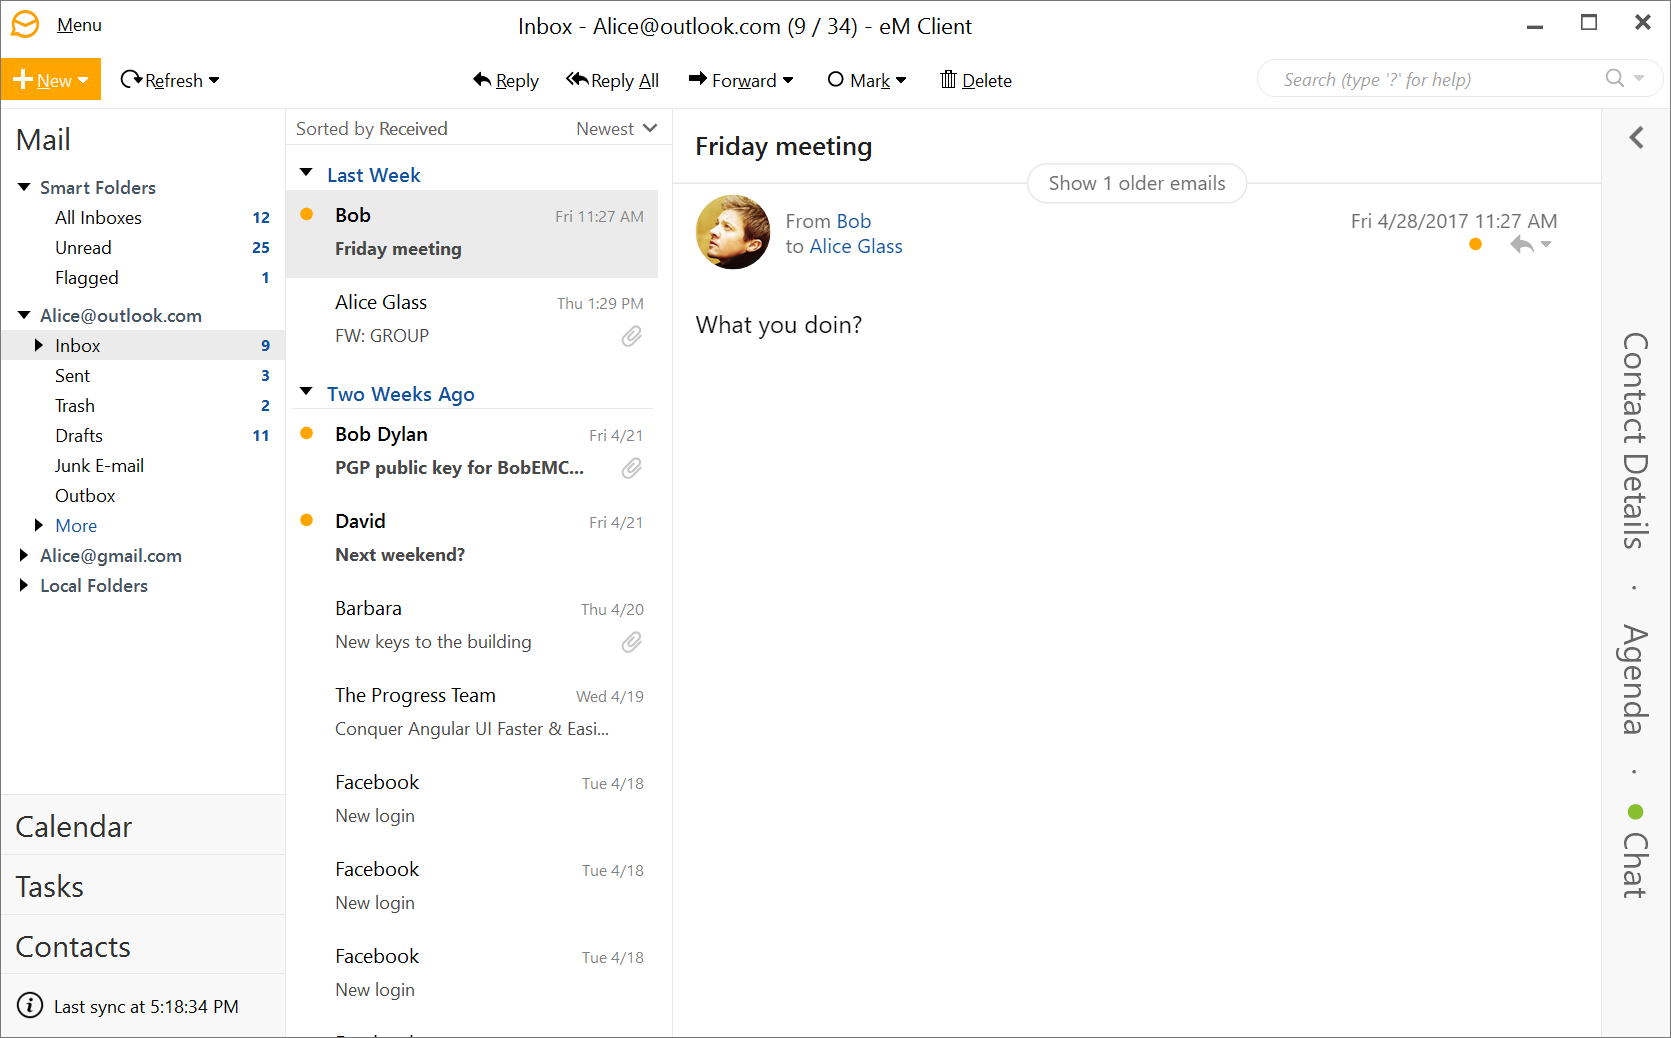 eM Client | Best Email Client for Windows XP, Vista, 7, 8 and 10